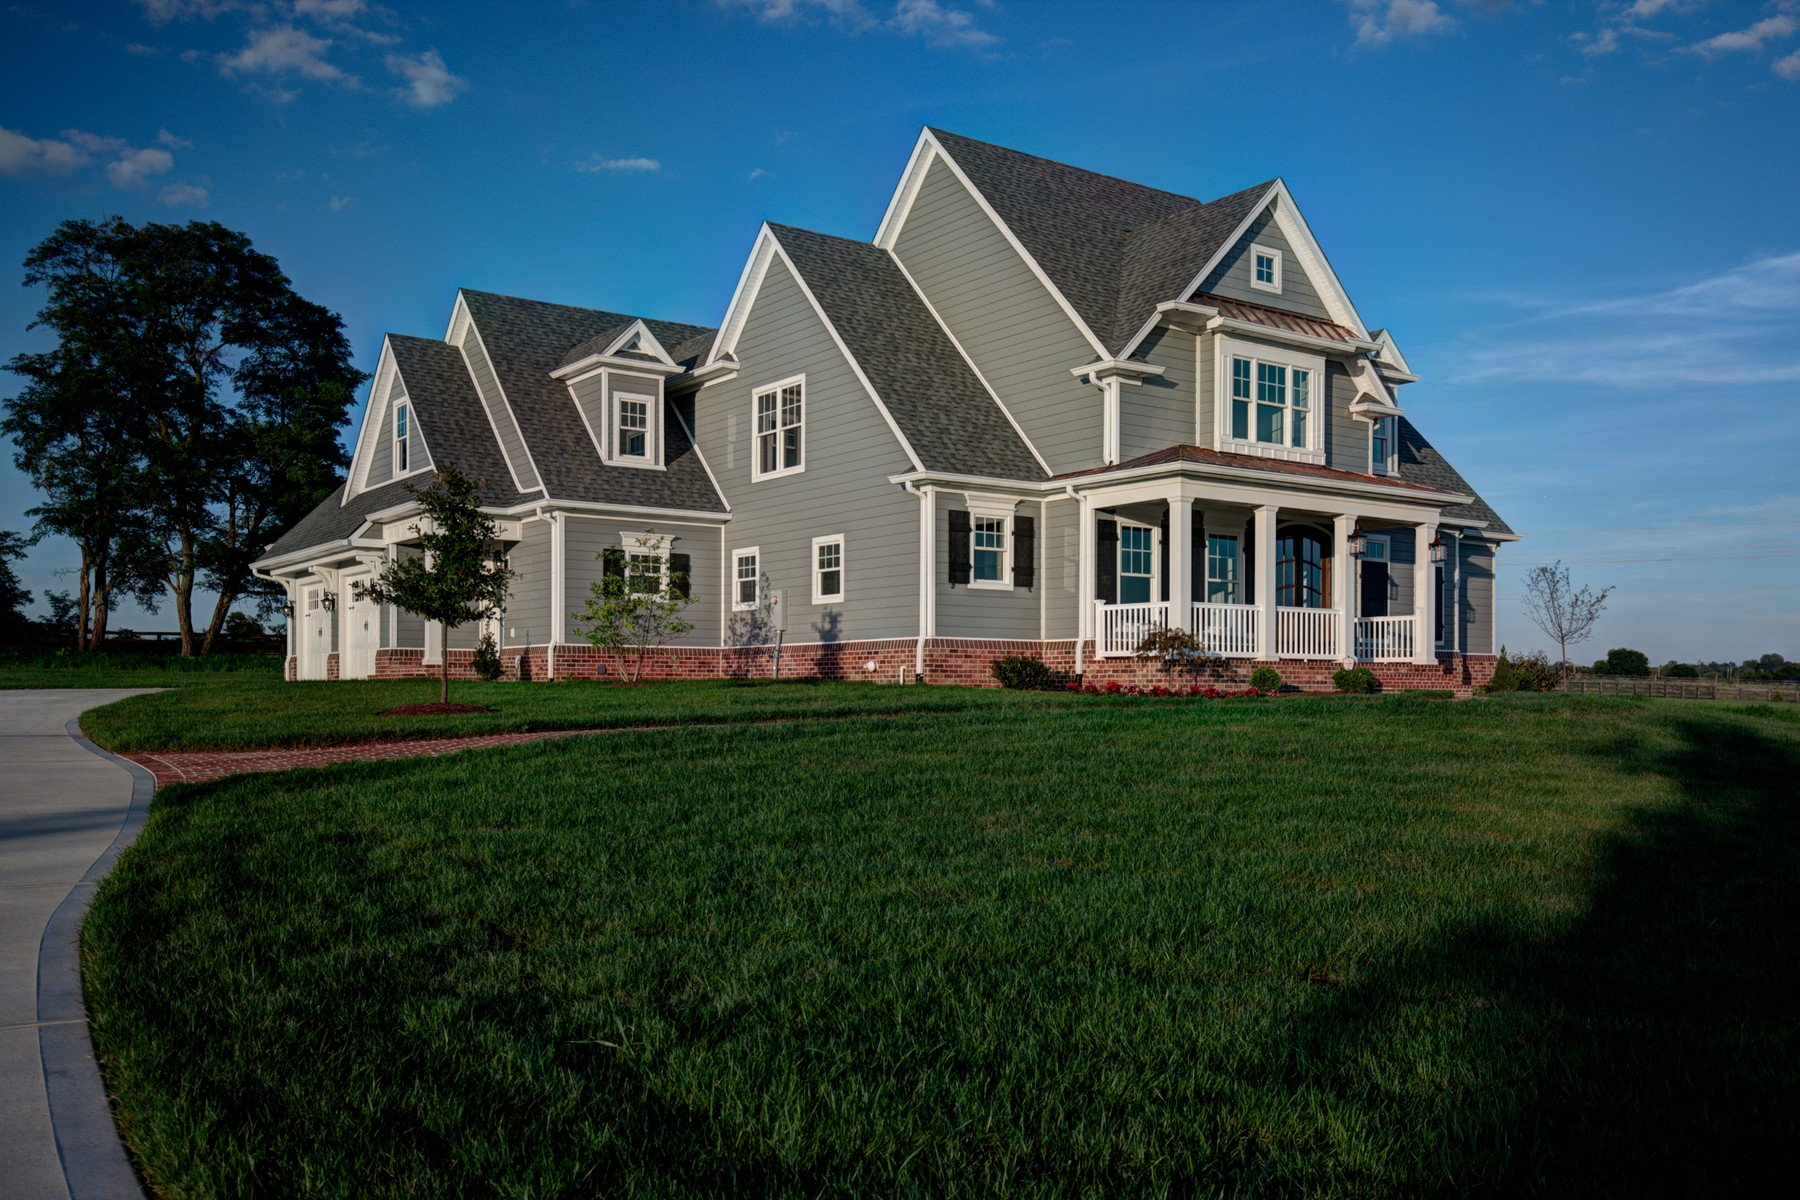 Casa Unifamiliar por un Venta en 208 The Oaks Blvd Nicholasville, Kentucky, 40356 Estados Unidos